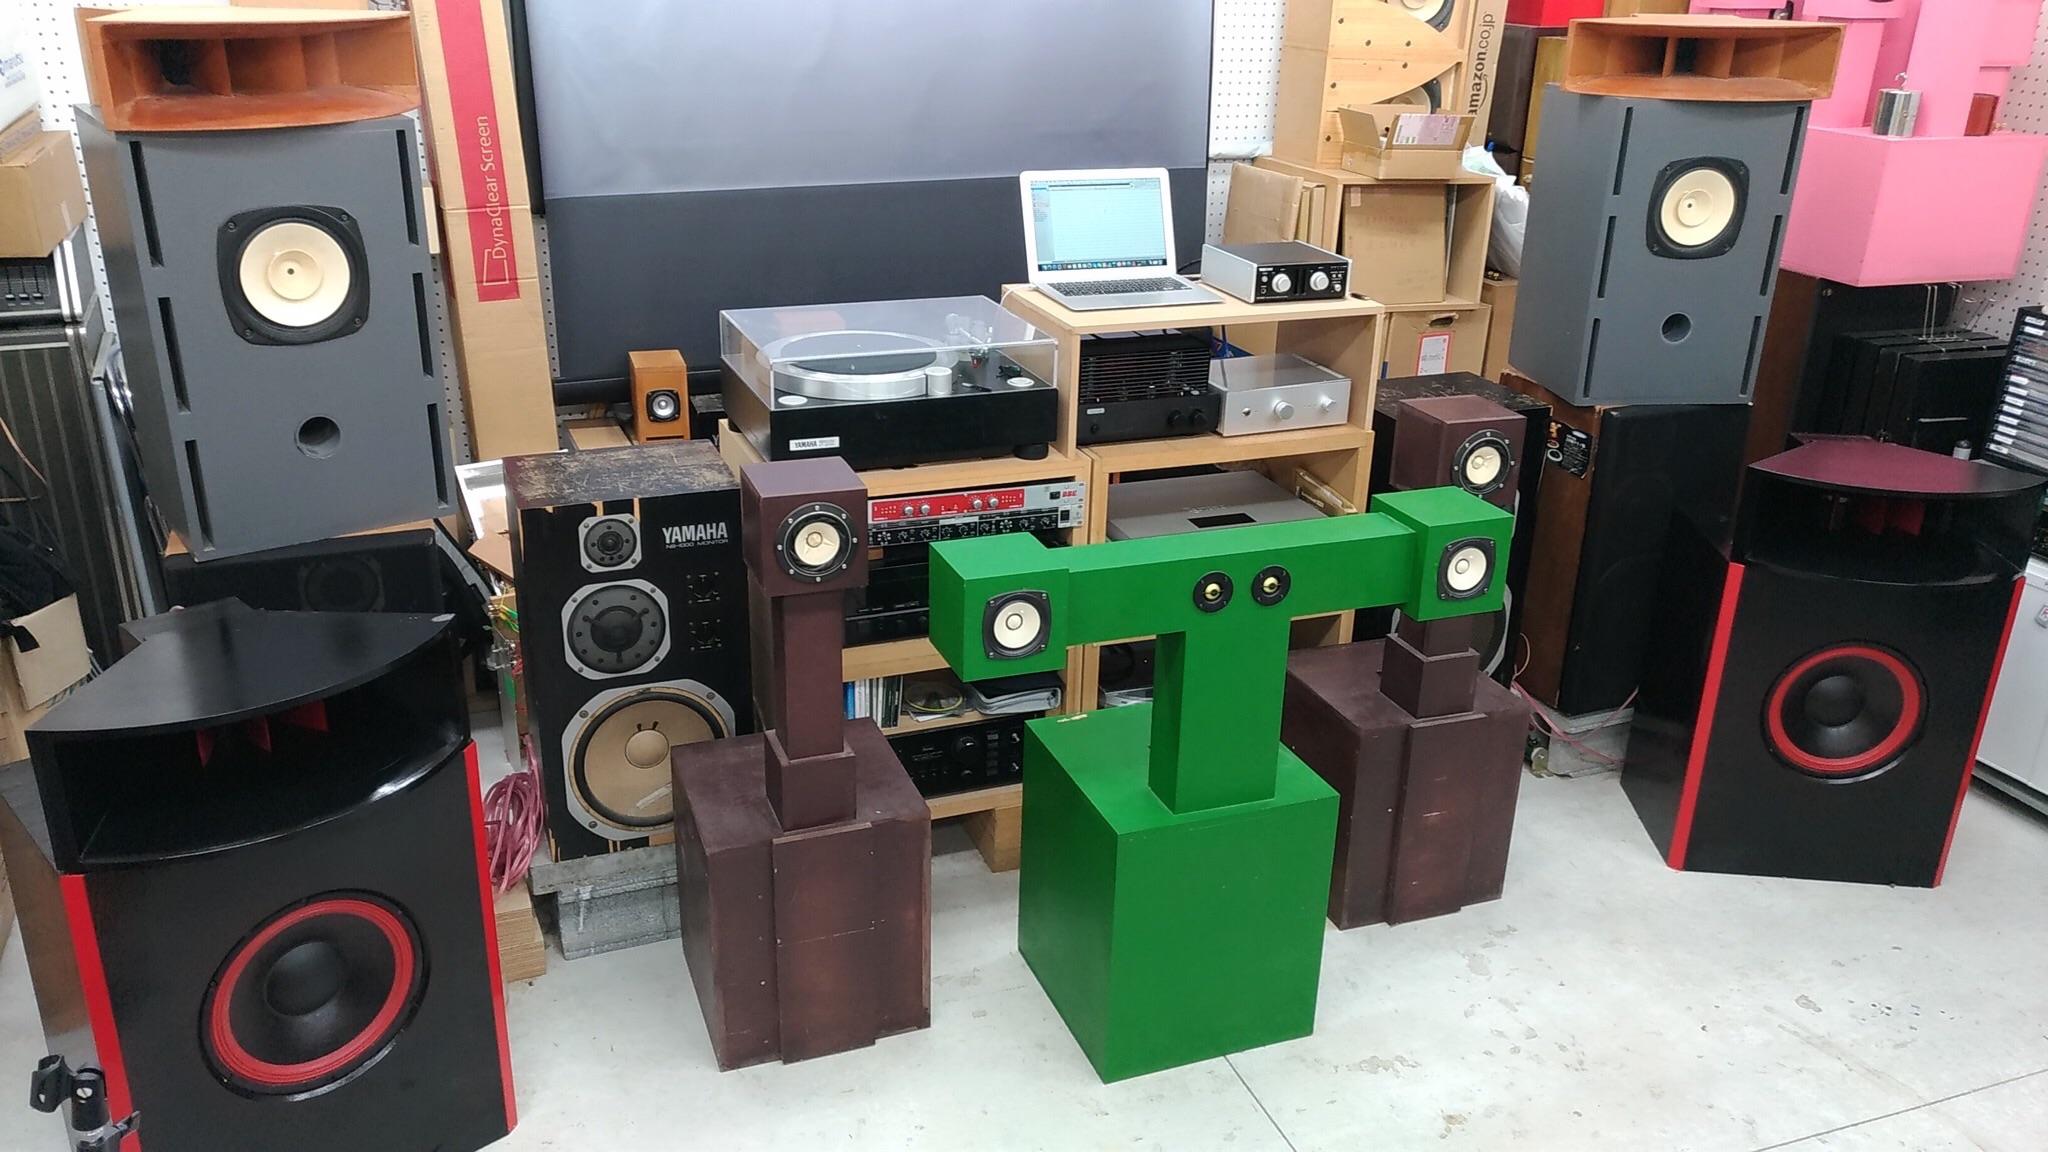 K-41音響工学研究会